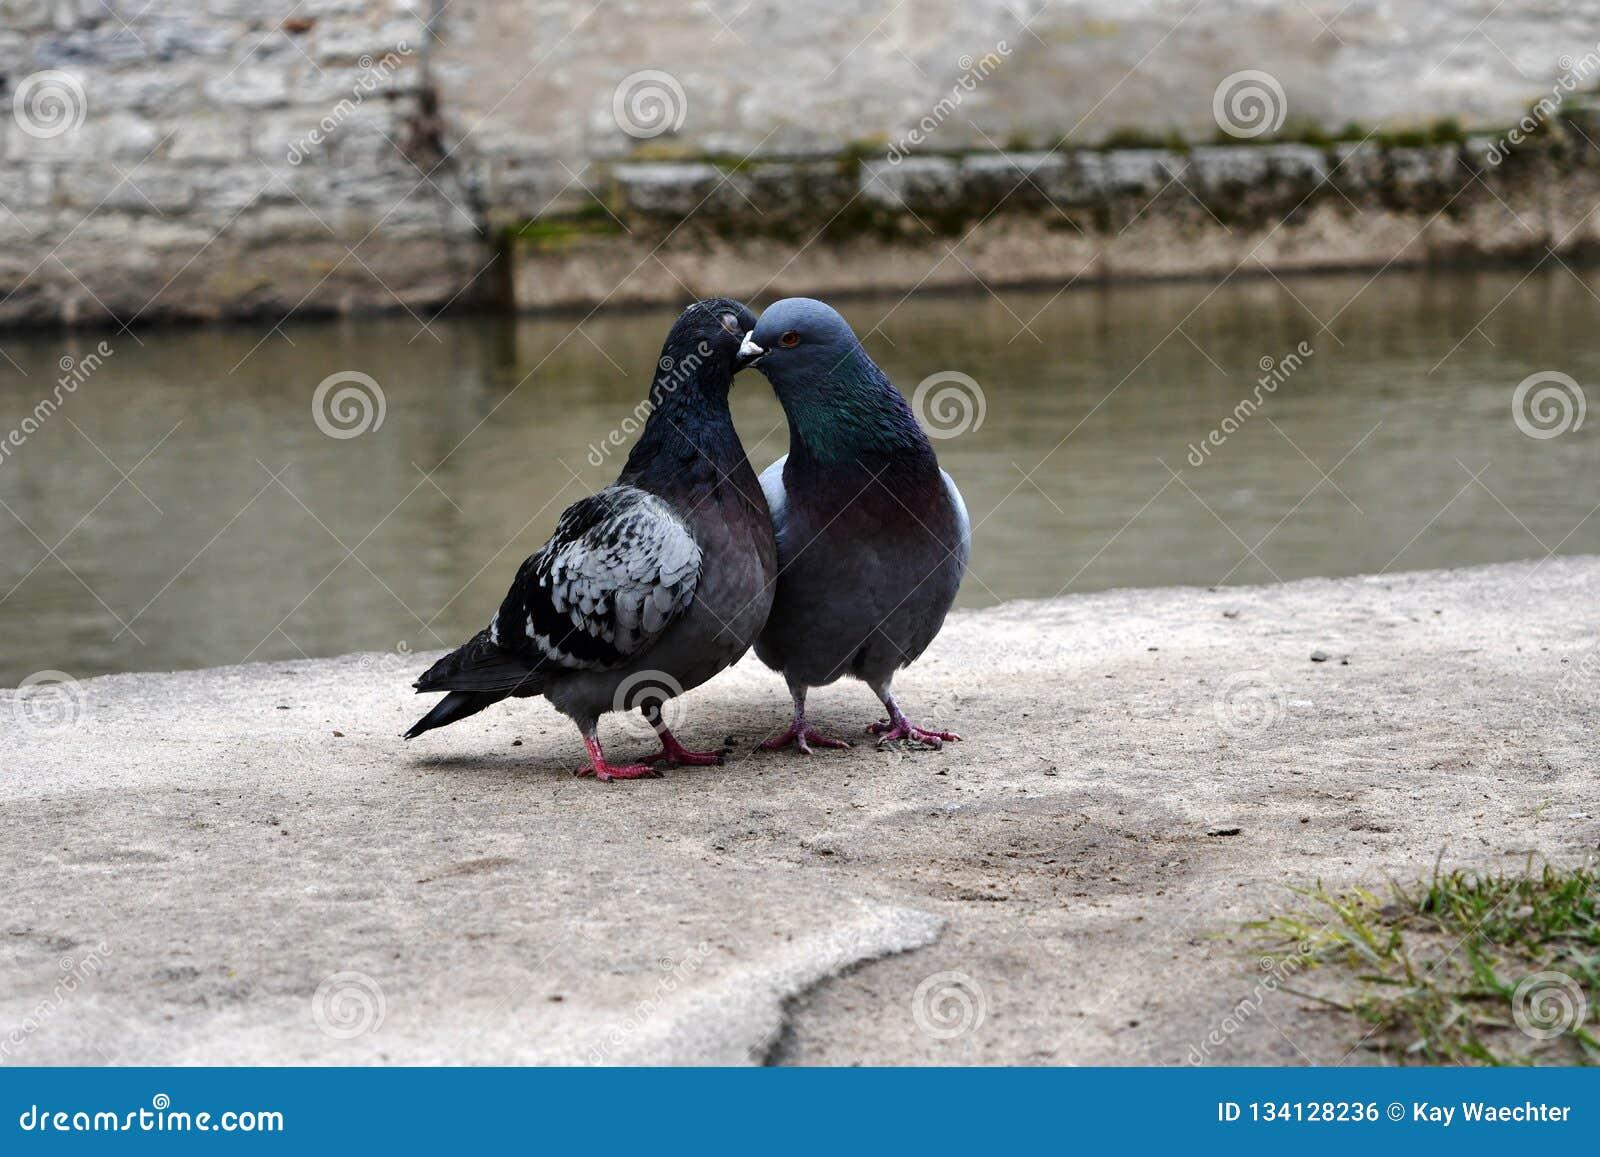 Romantic Pigeons Whispering